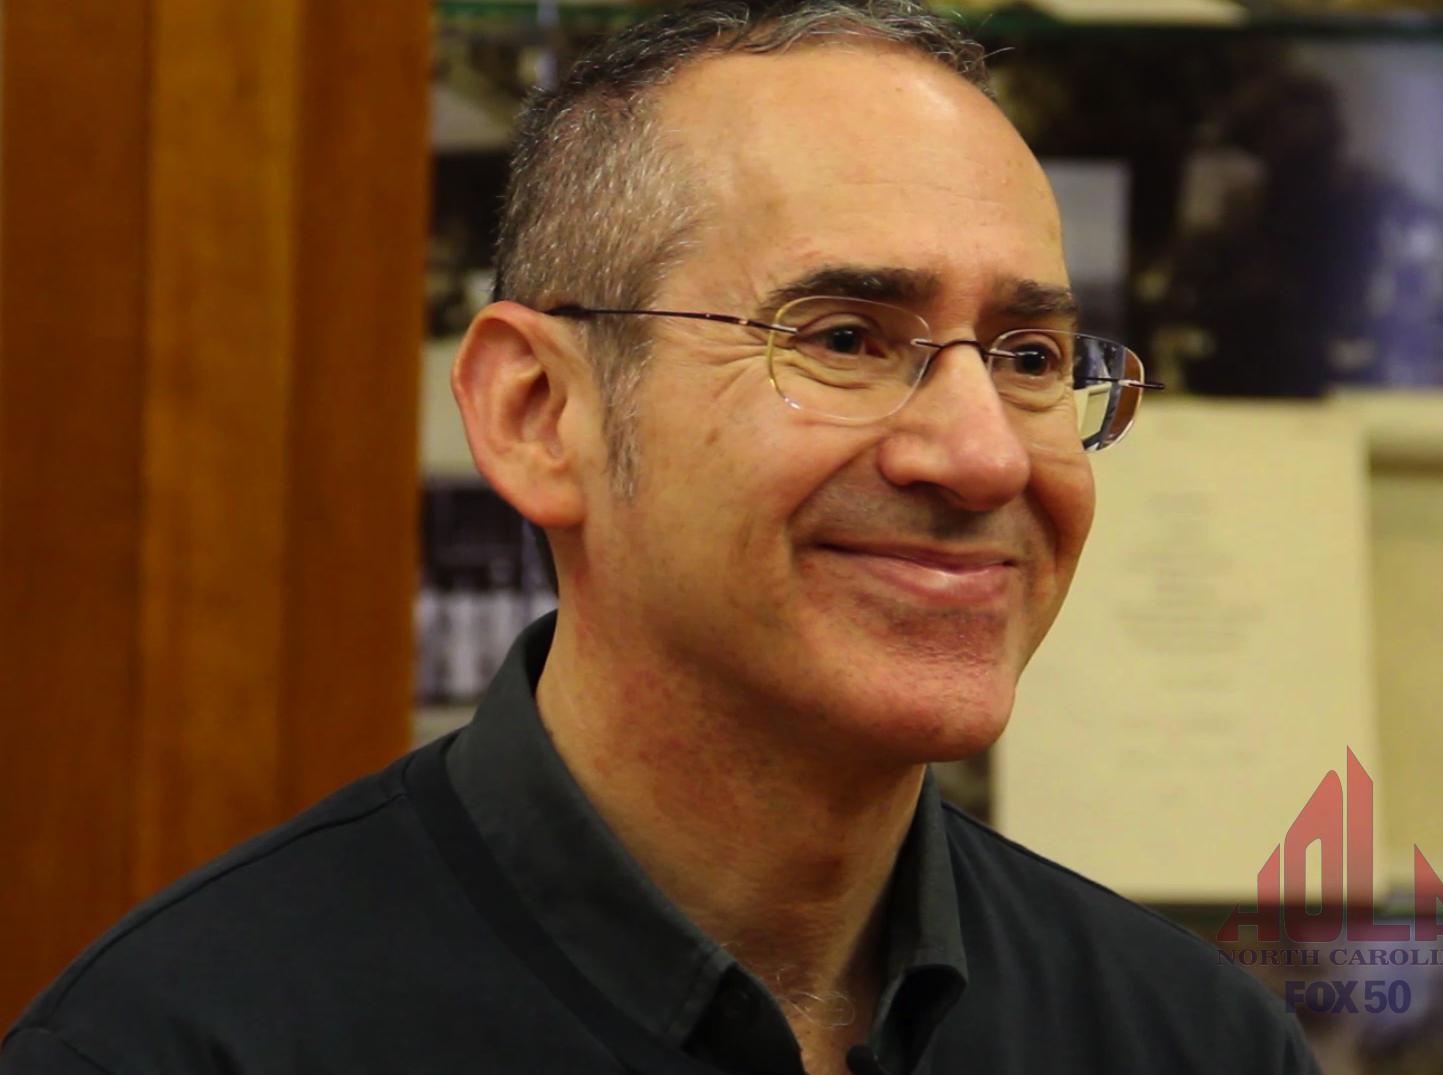 MALS Professor smiling